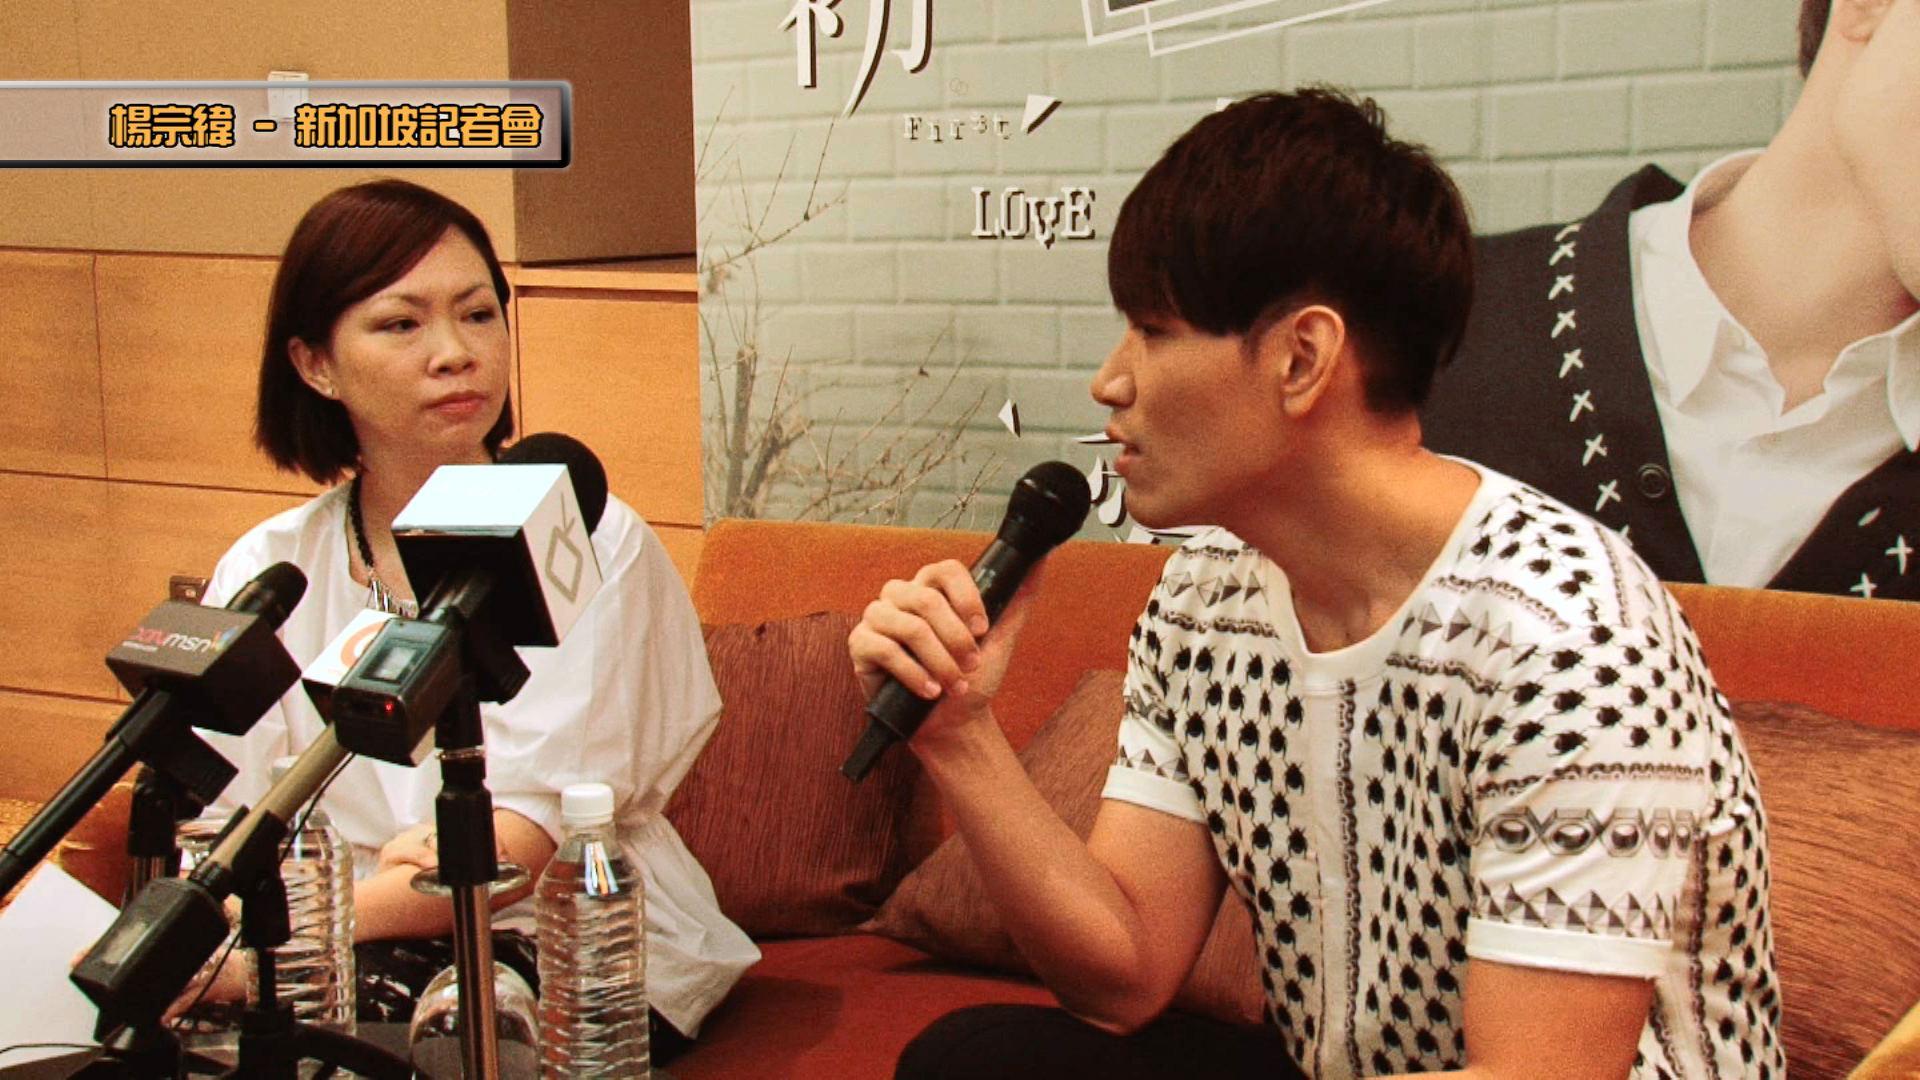 [Press Conference] Aska Yang (楊宗緯) – In Singapore 2013 (Part 1)